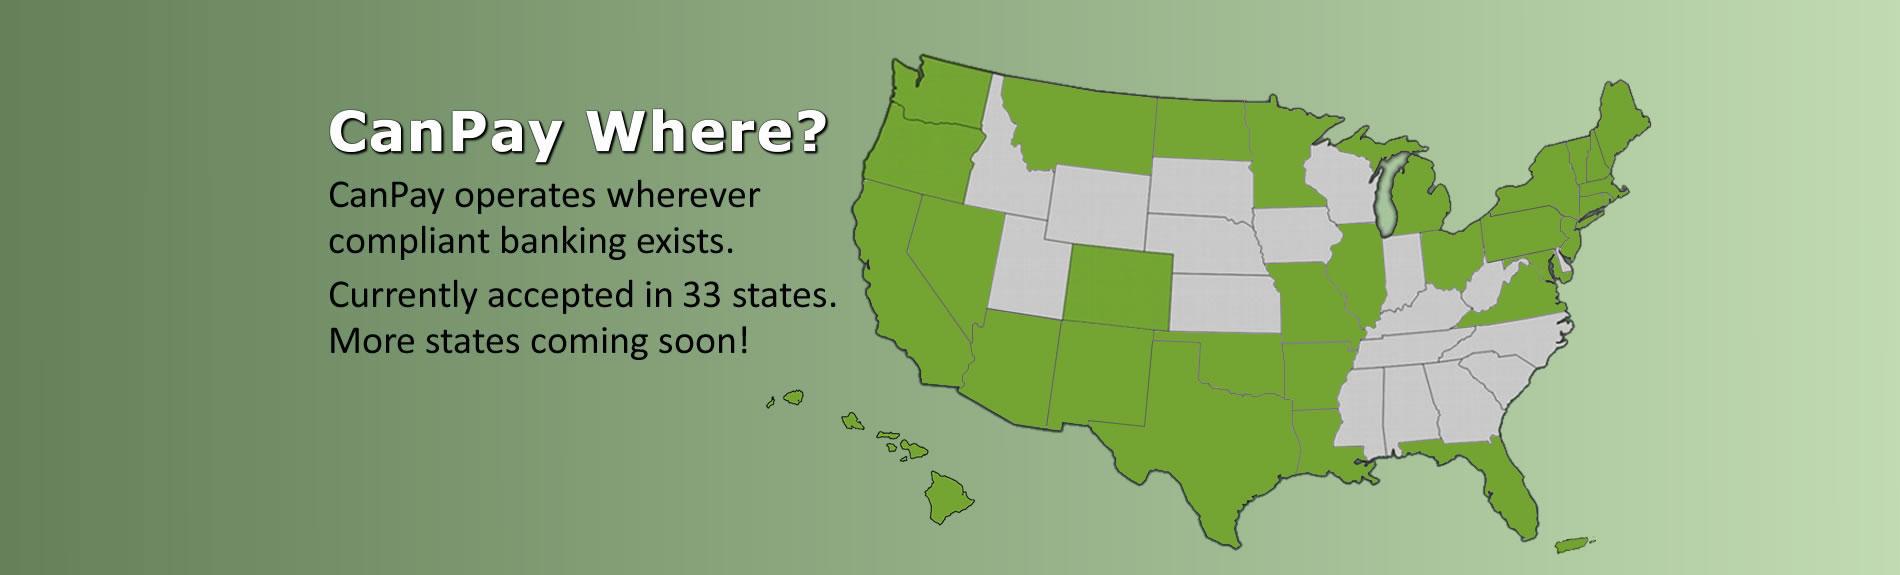 CanPay Debit - US Map